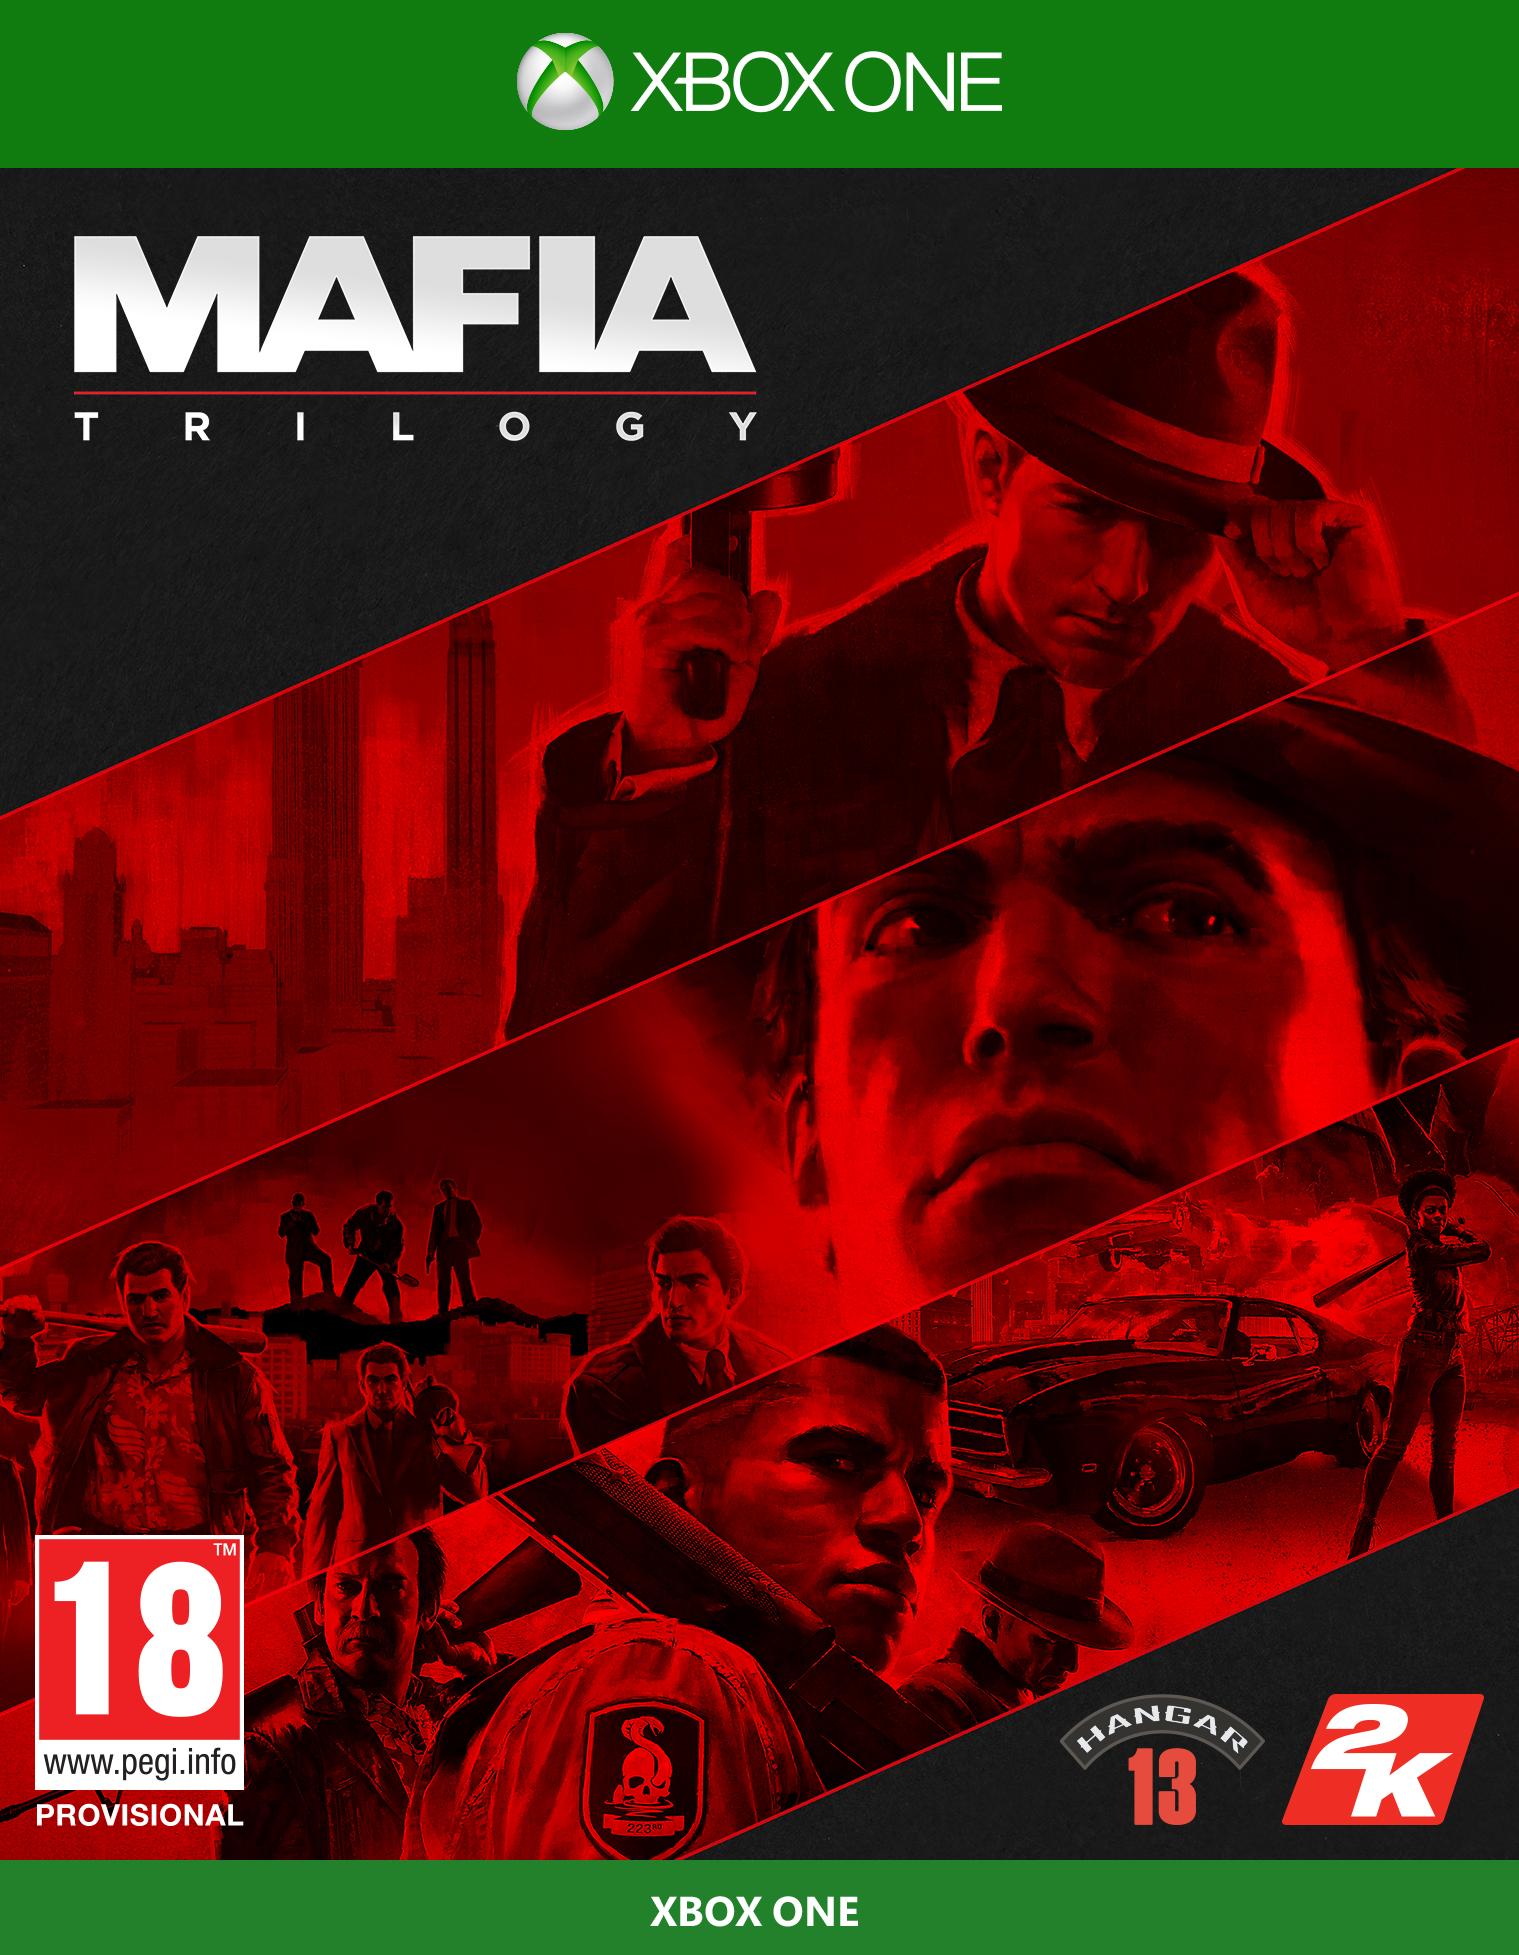 coolshop.co.uk - Mafia Trilogy